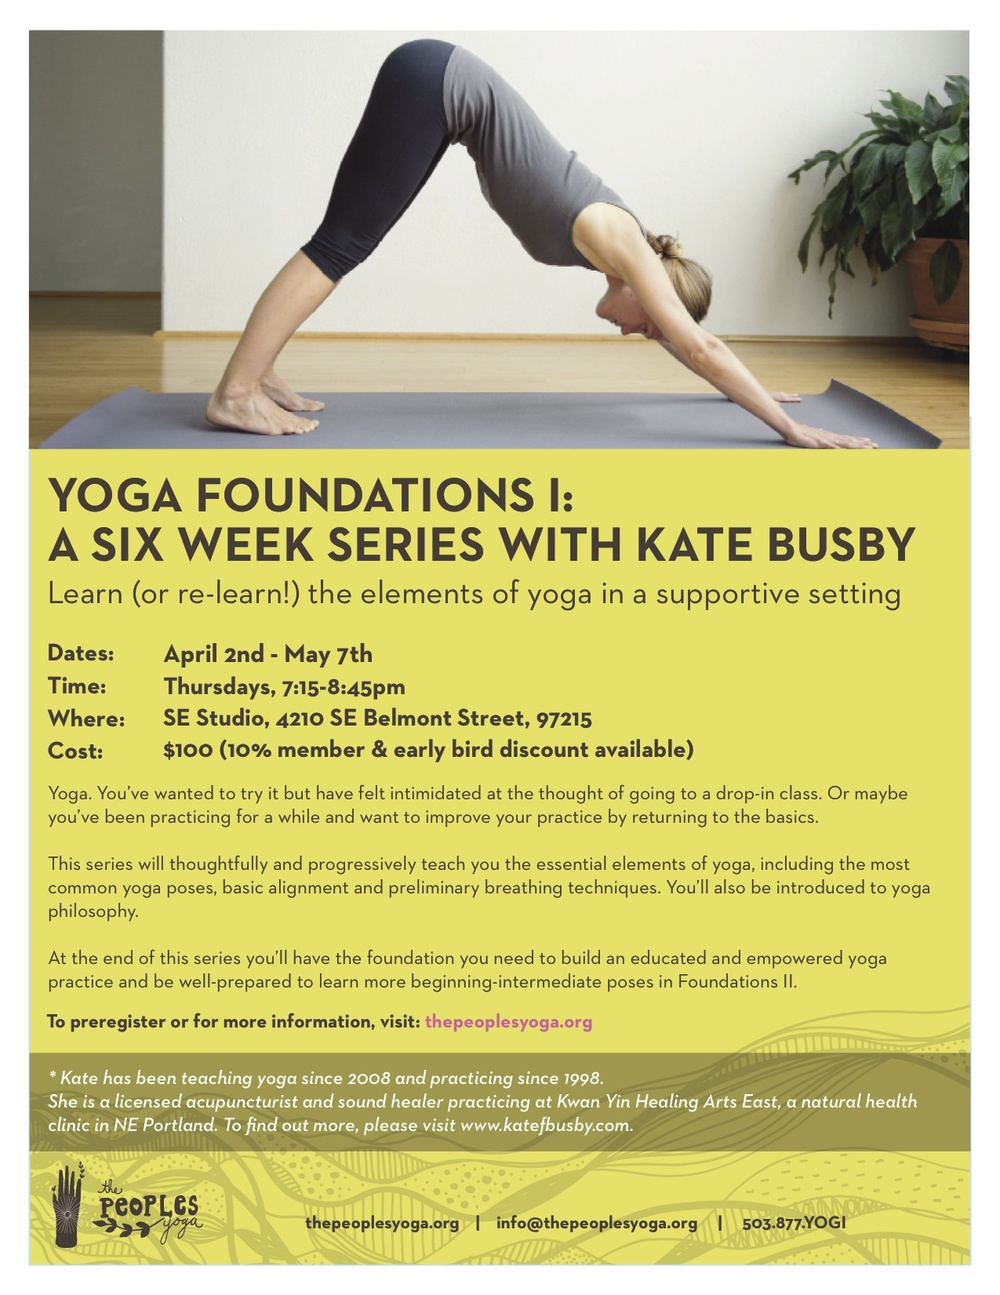 YogaFoundations_Flyer_Spring15.jpg